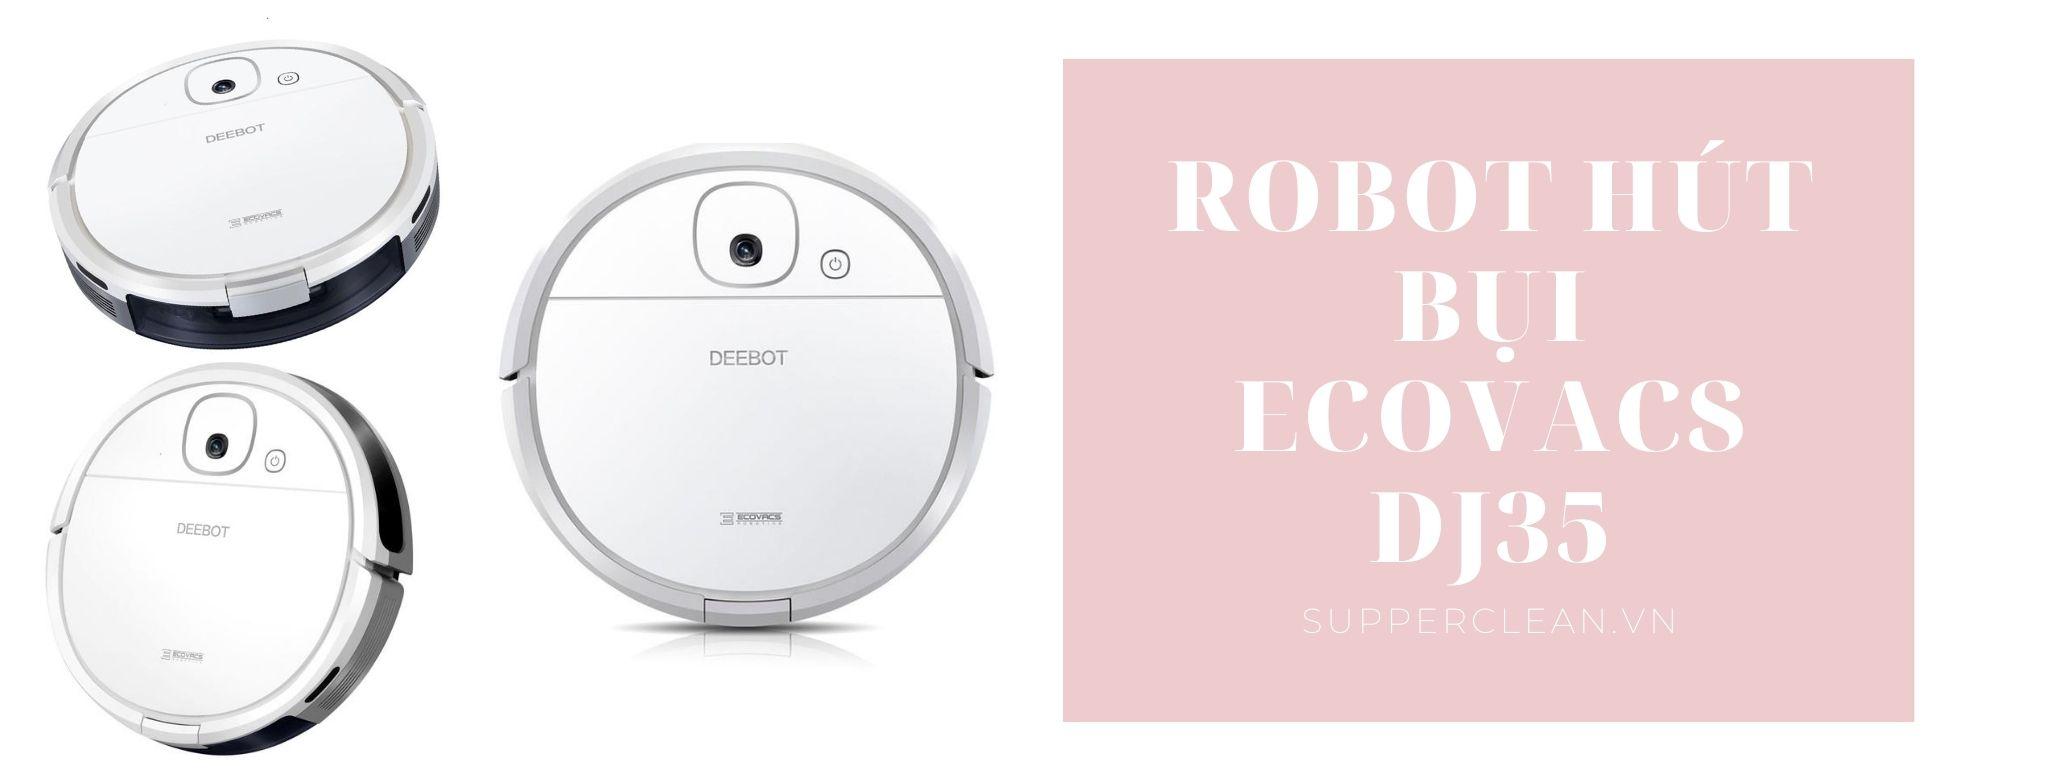 robot hut bui ecovacs dj35